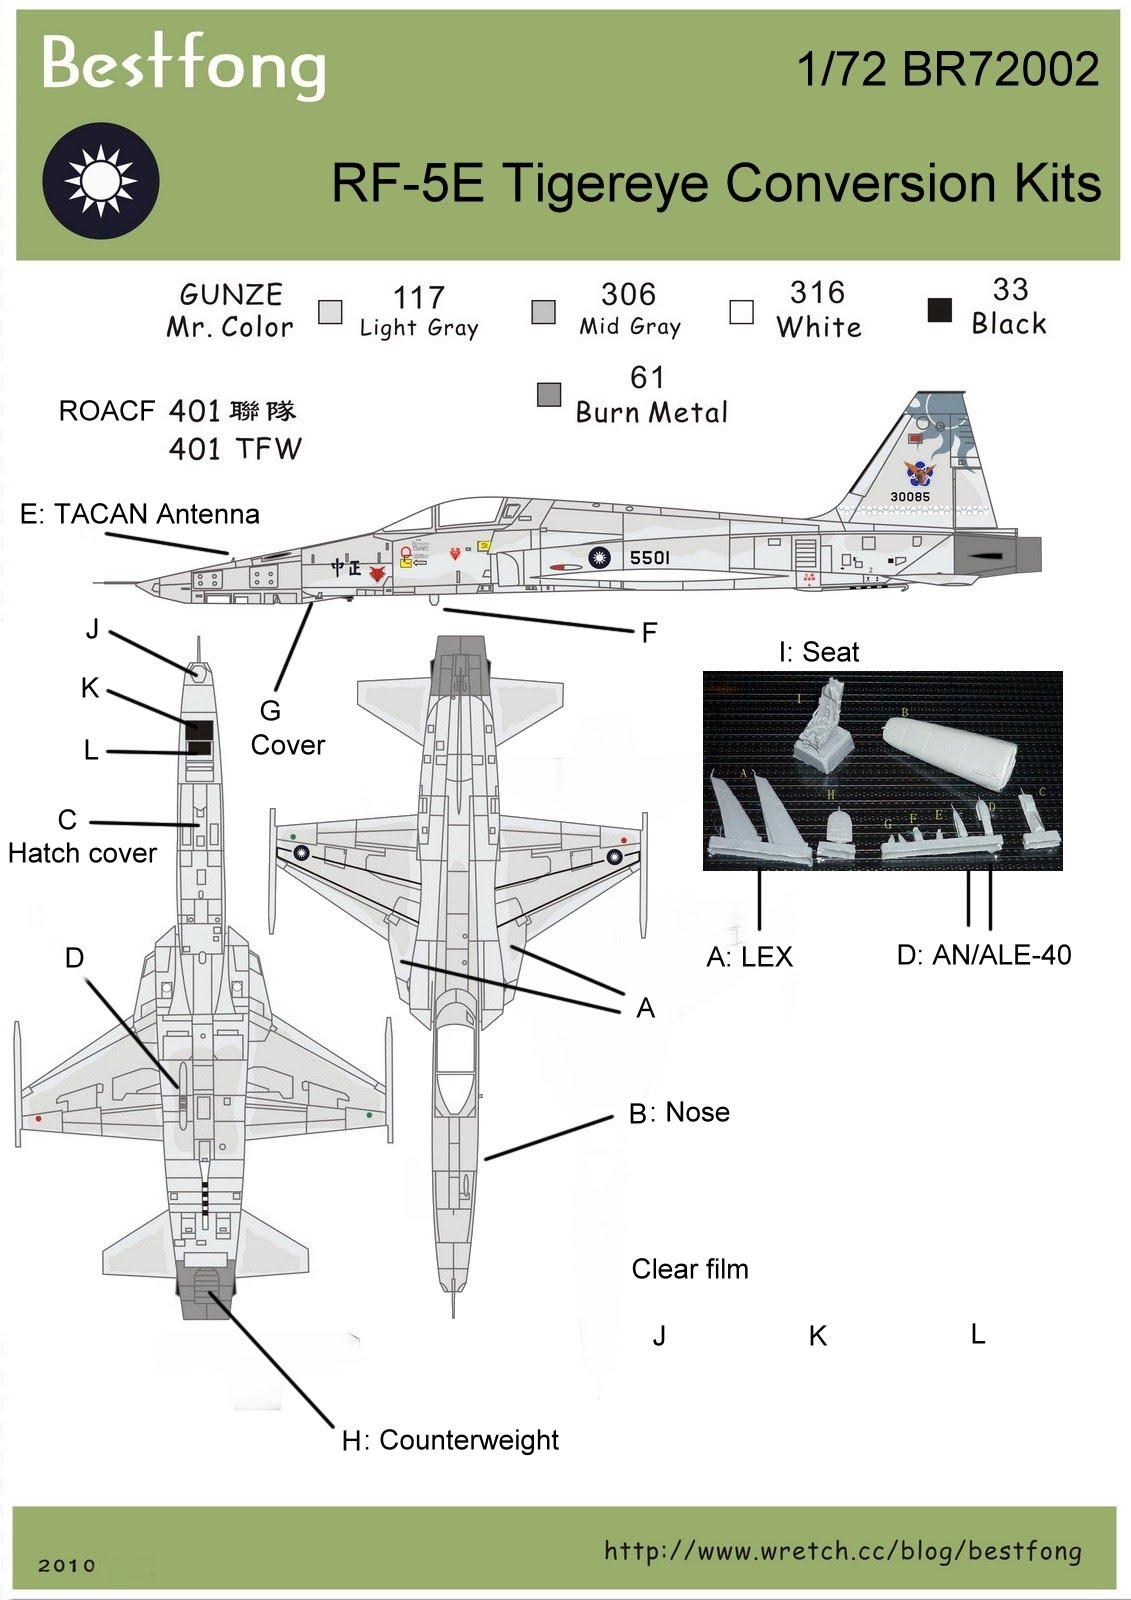 Berita Dunia Model Kit... - Page 2 72BR002RF-5E